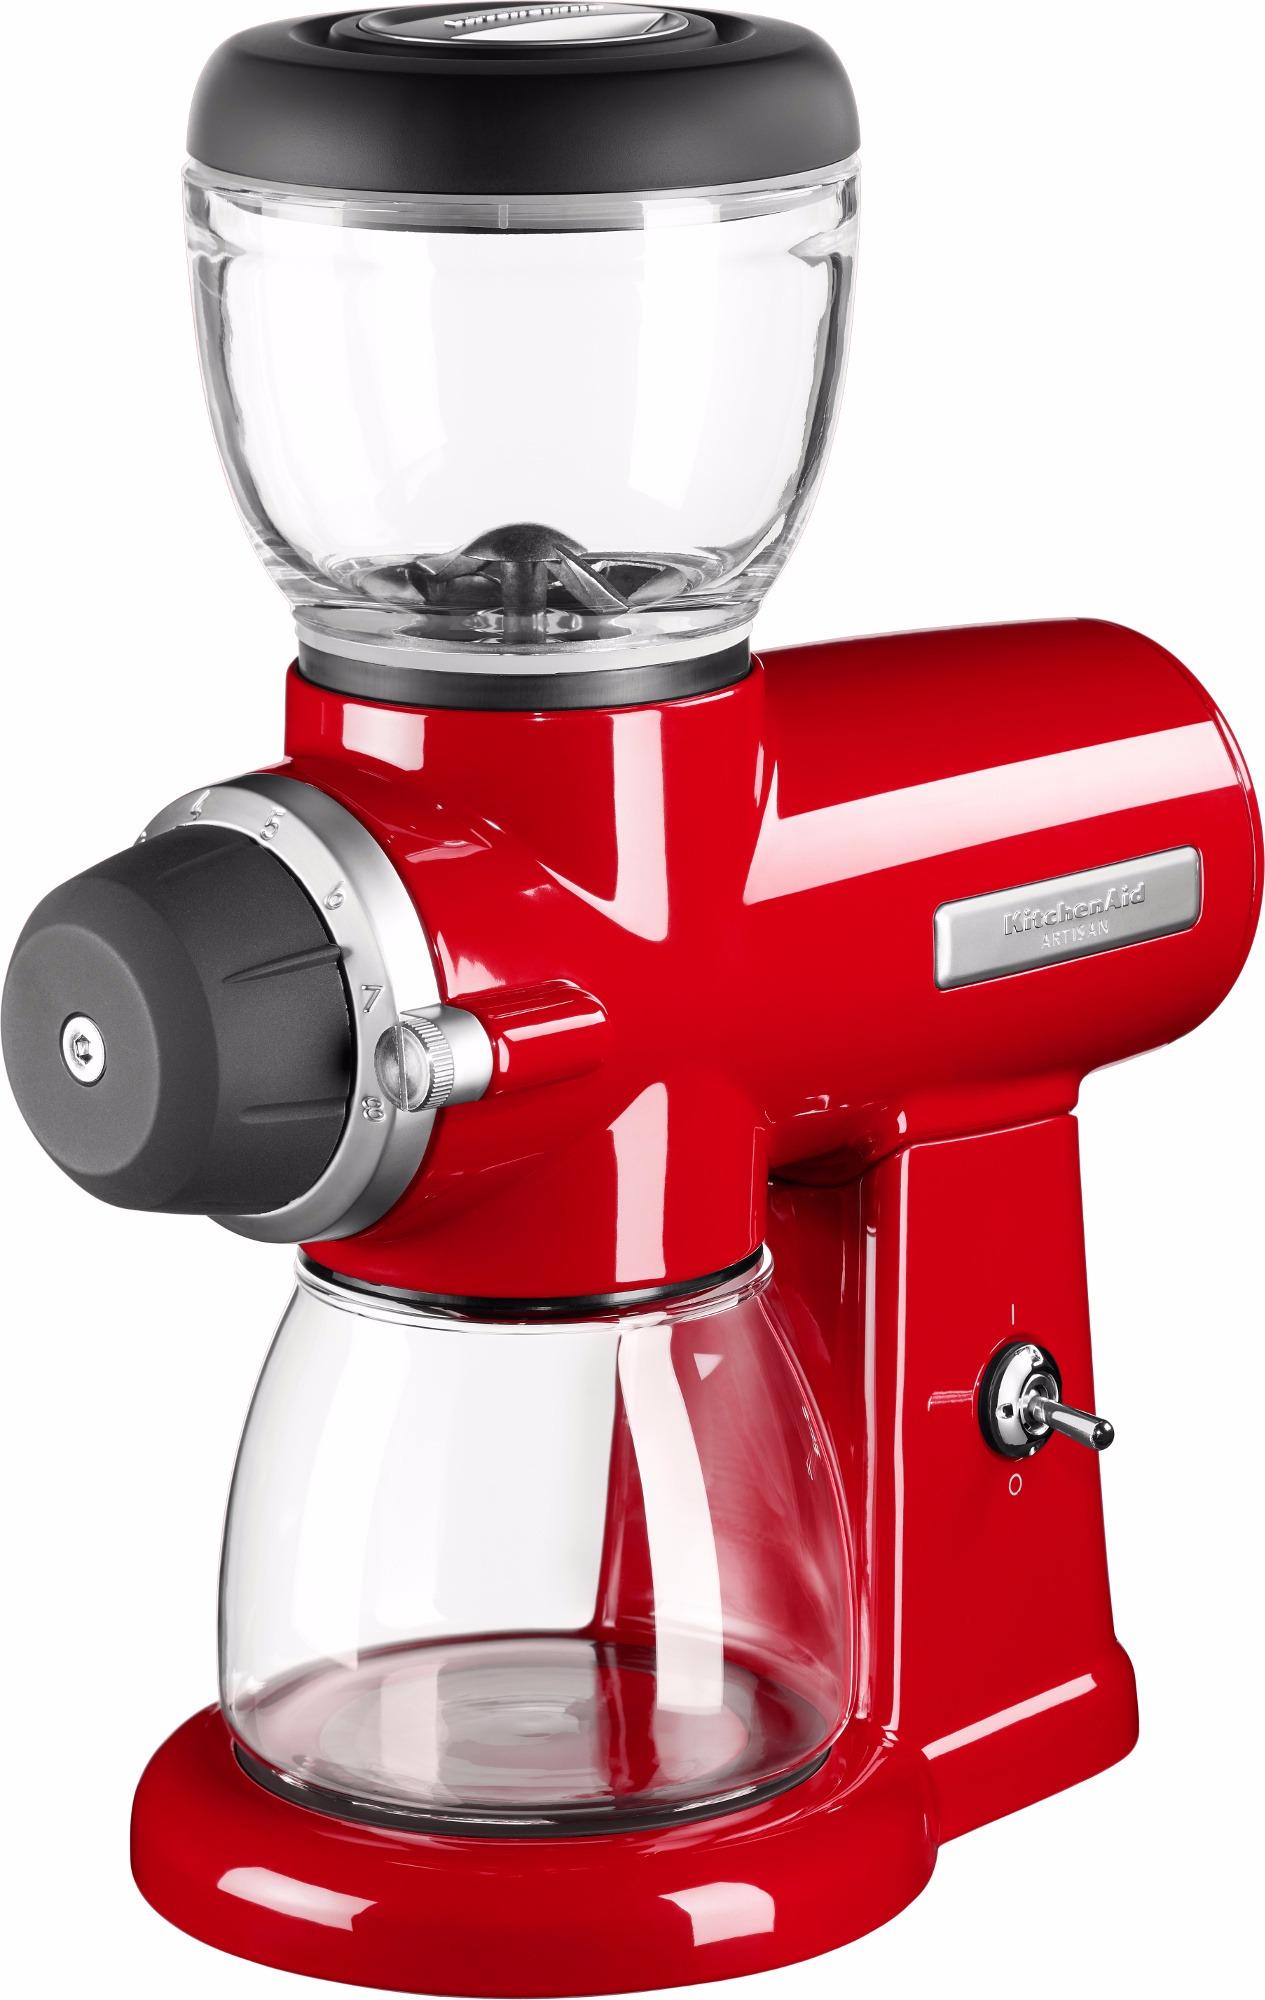 Kitchenaid Artisan 702eer Burr Coffee Grinder Empire Red